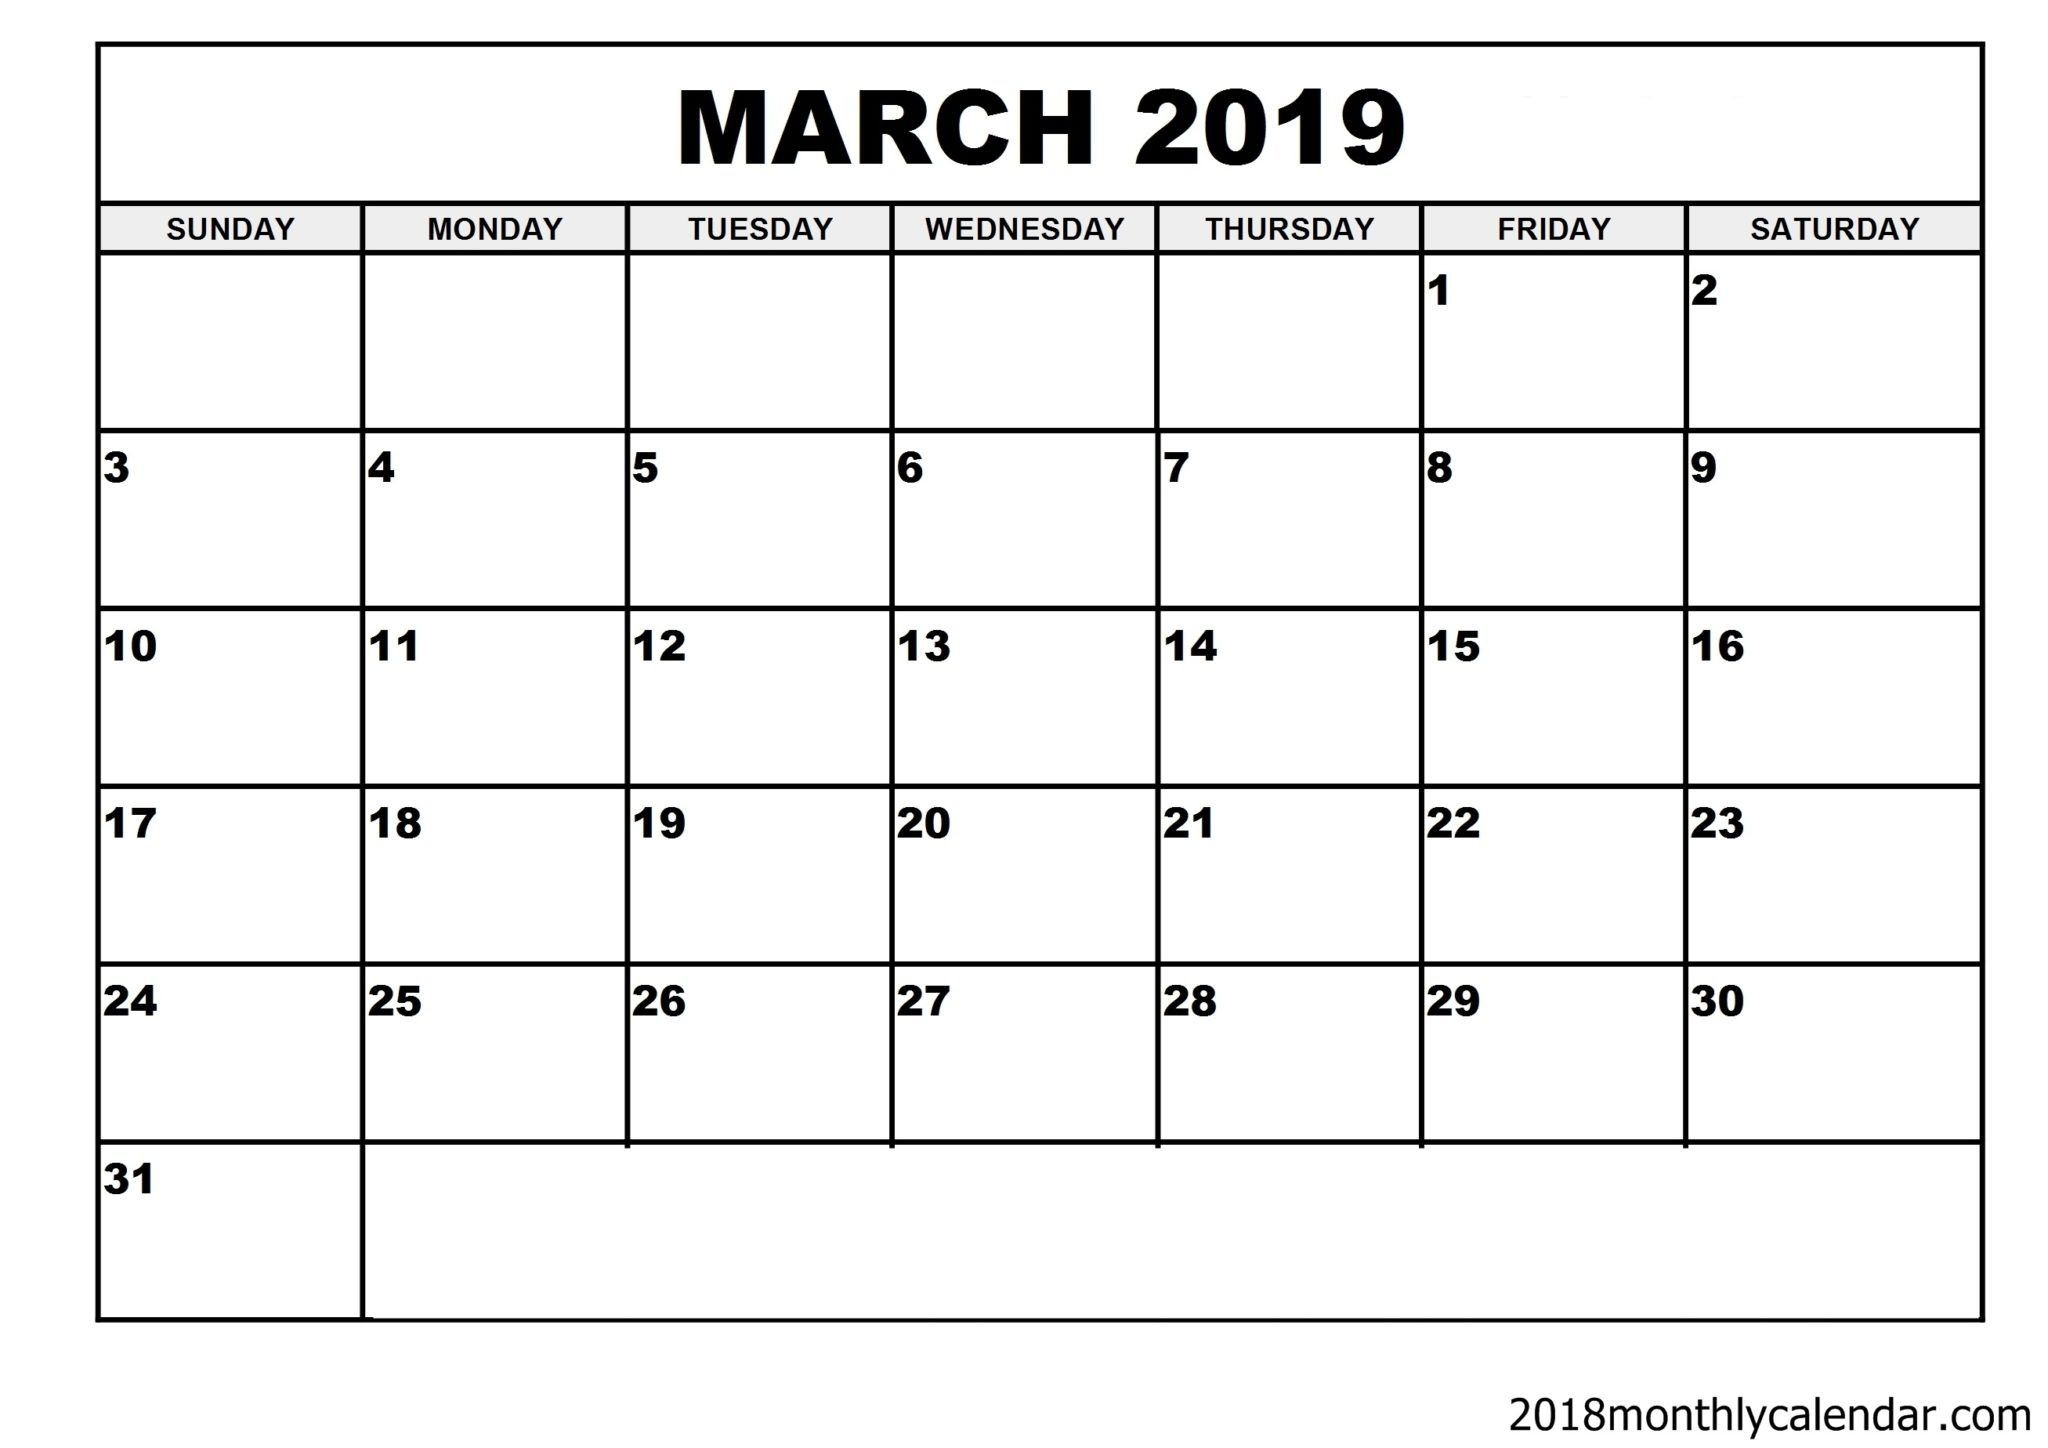 Download March 2019 Calendar – Blank Template Editable